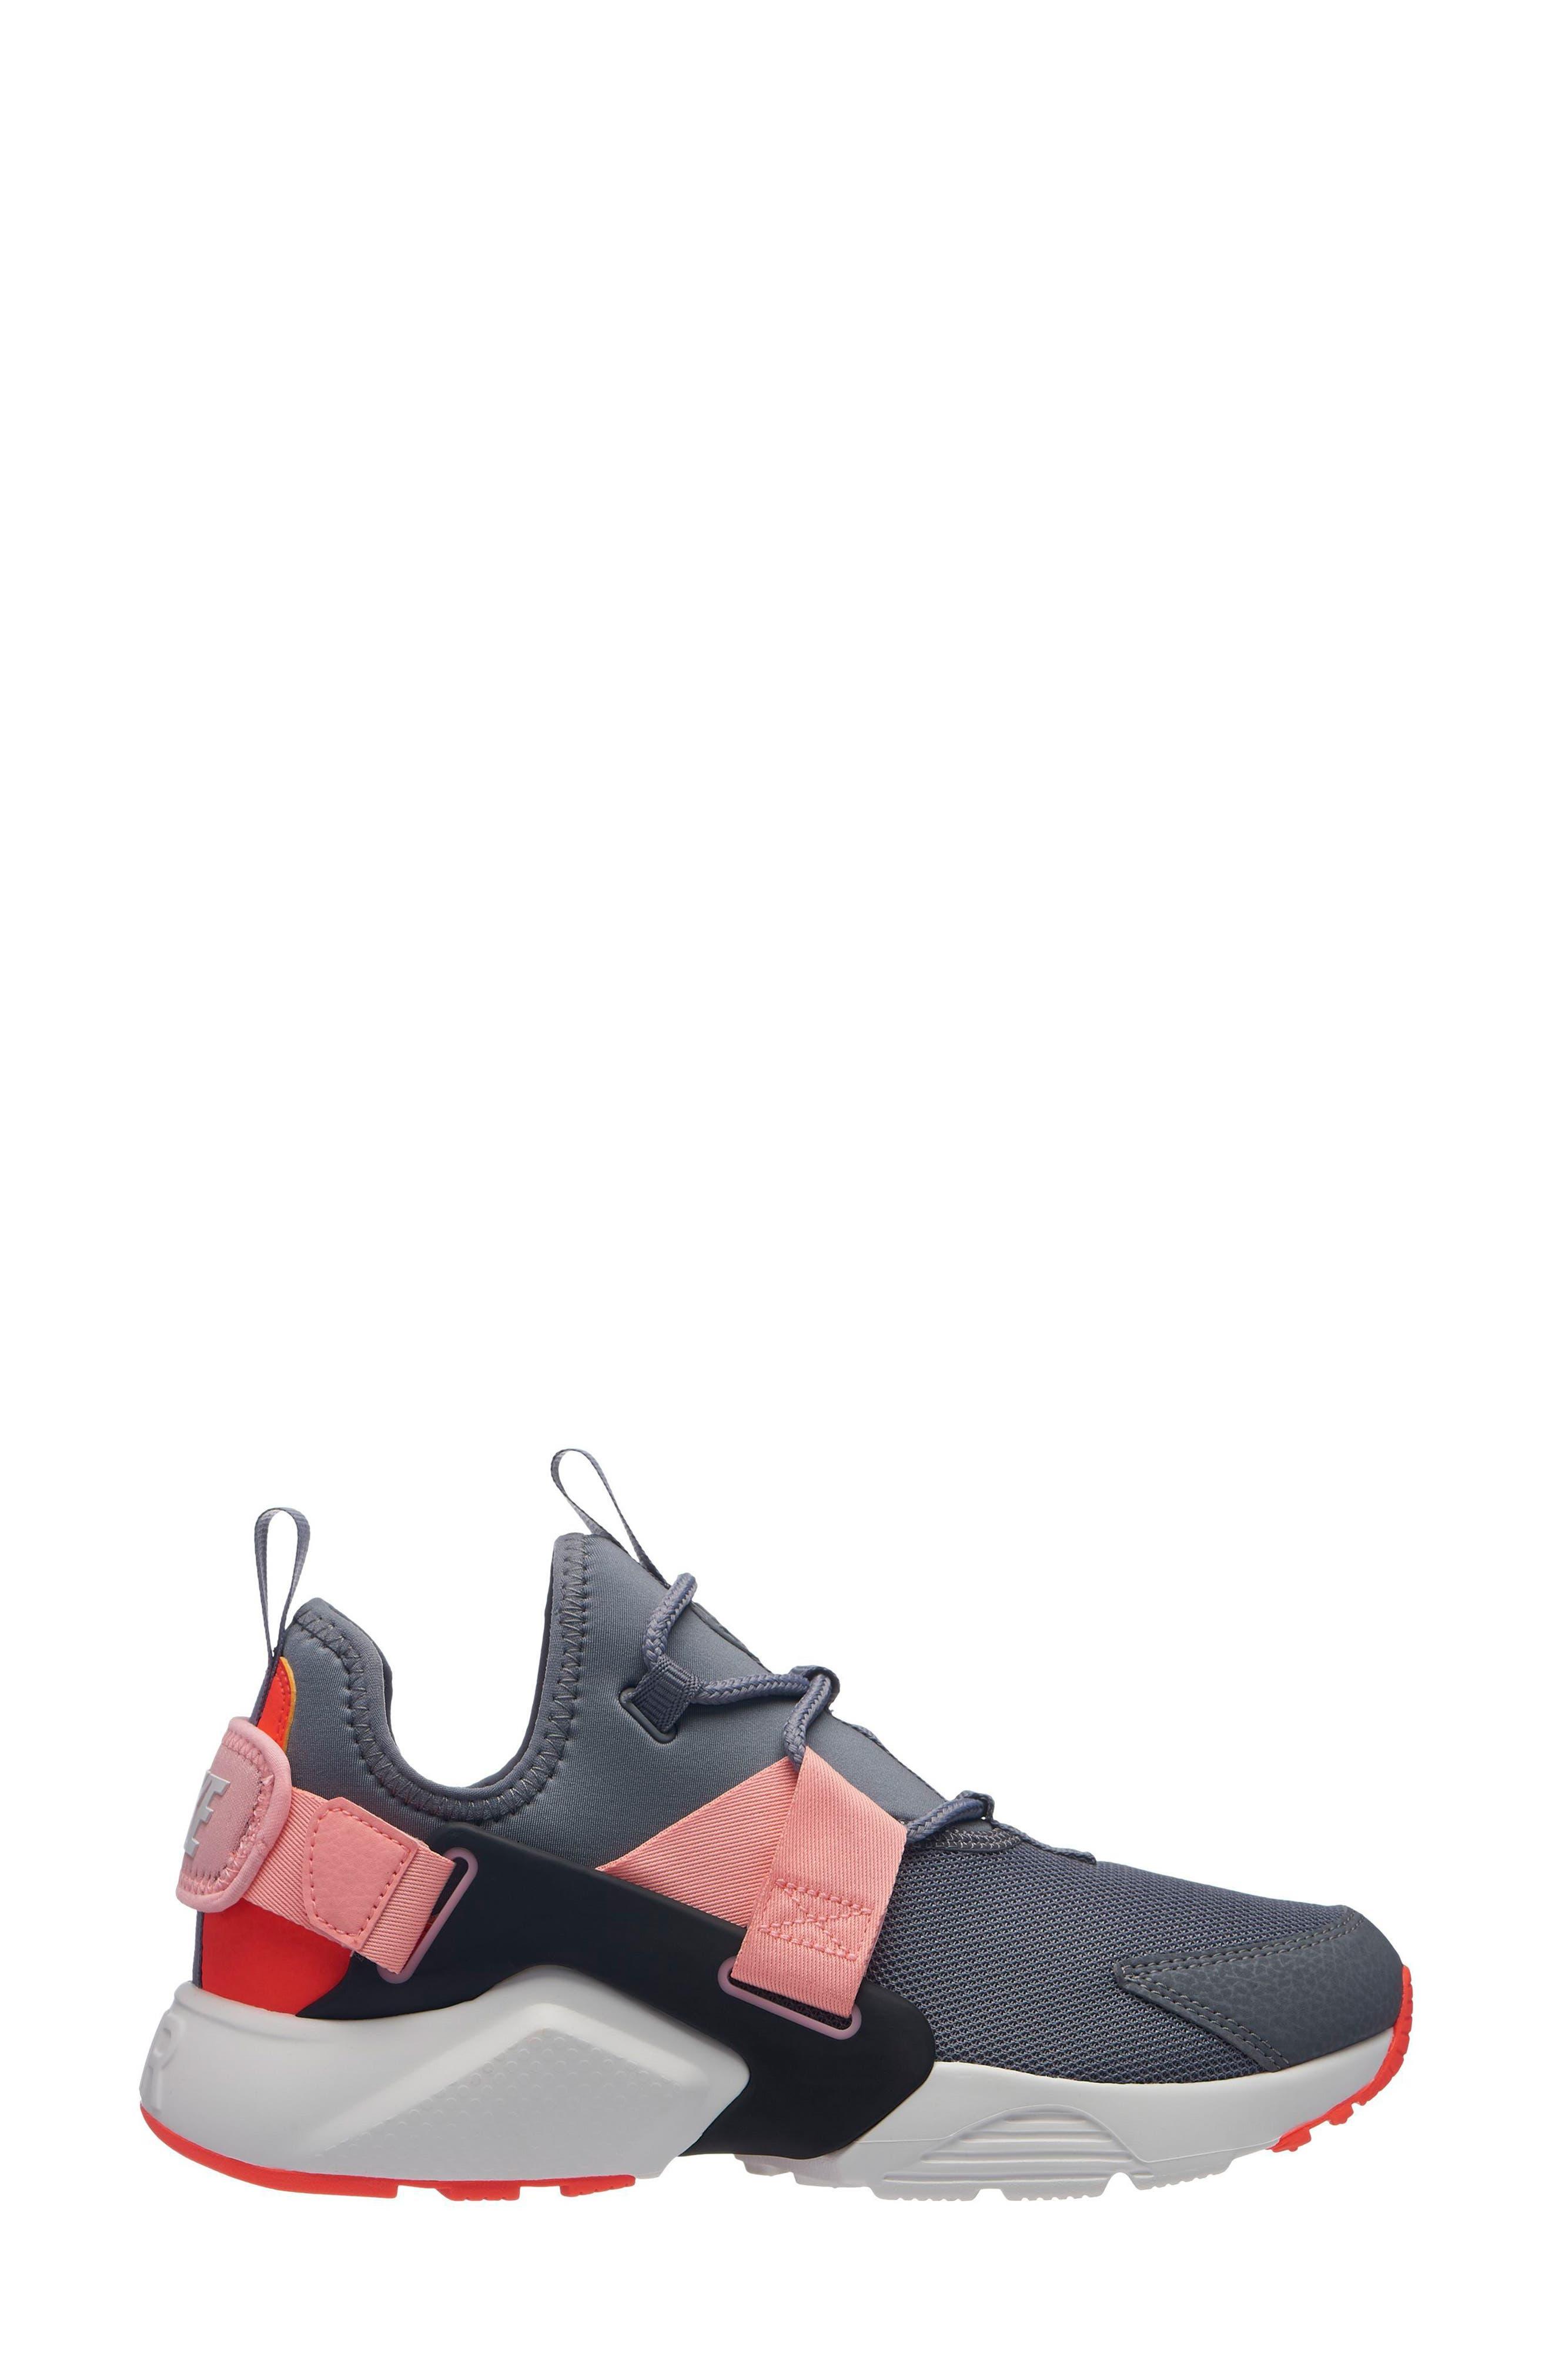 Air Huarache City Low Sneaker,                             Main thumbnail 1, color,                             GREY